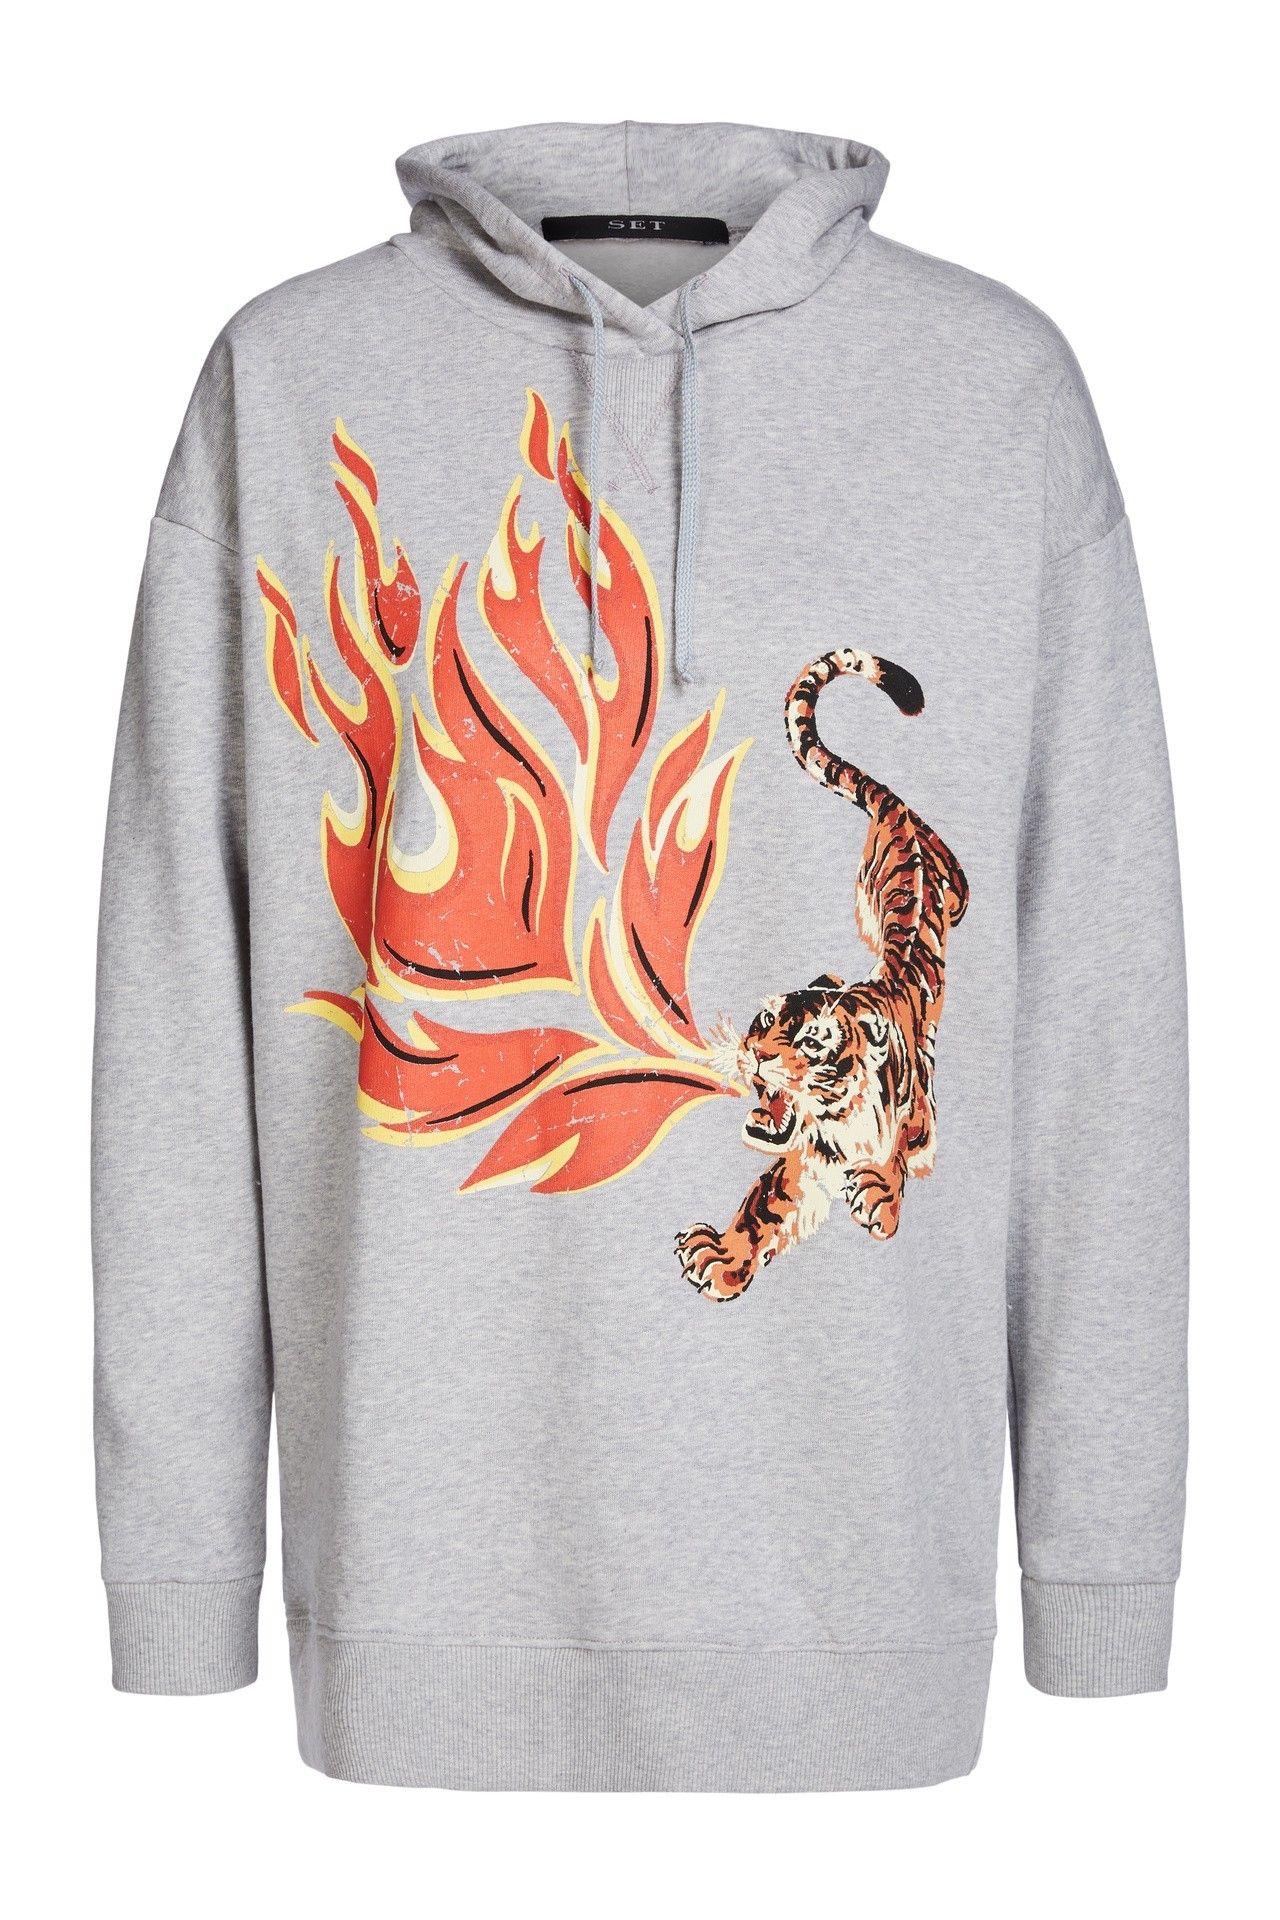 SET - Damen Pullover - Sweatshirt - Light Grey